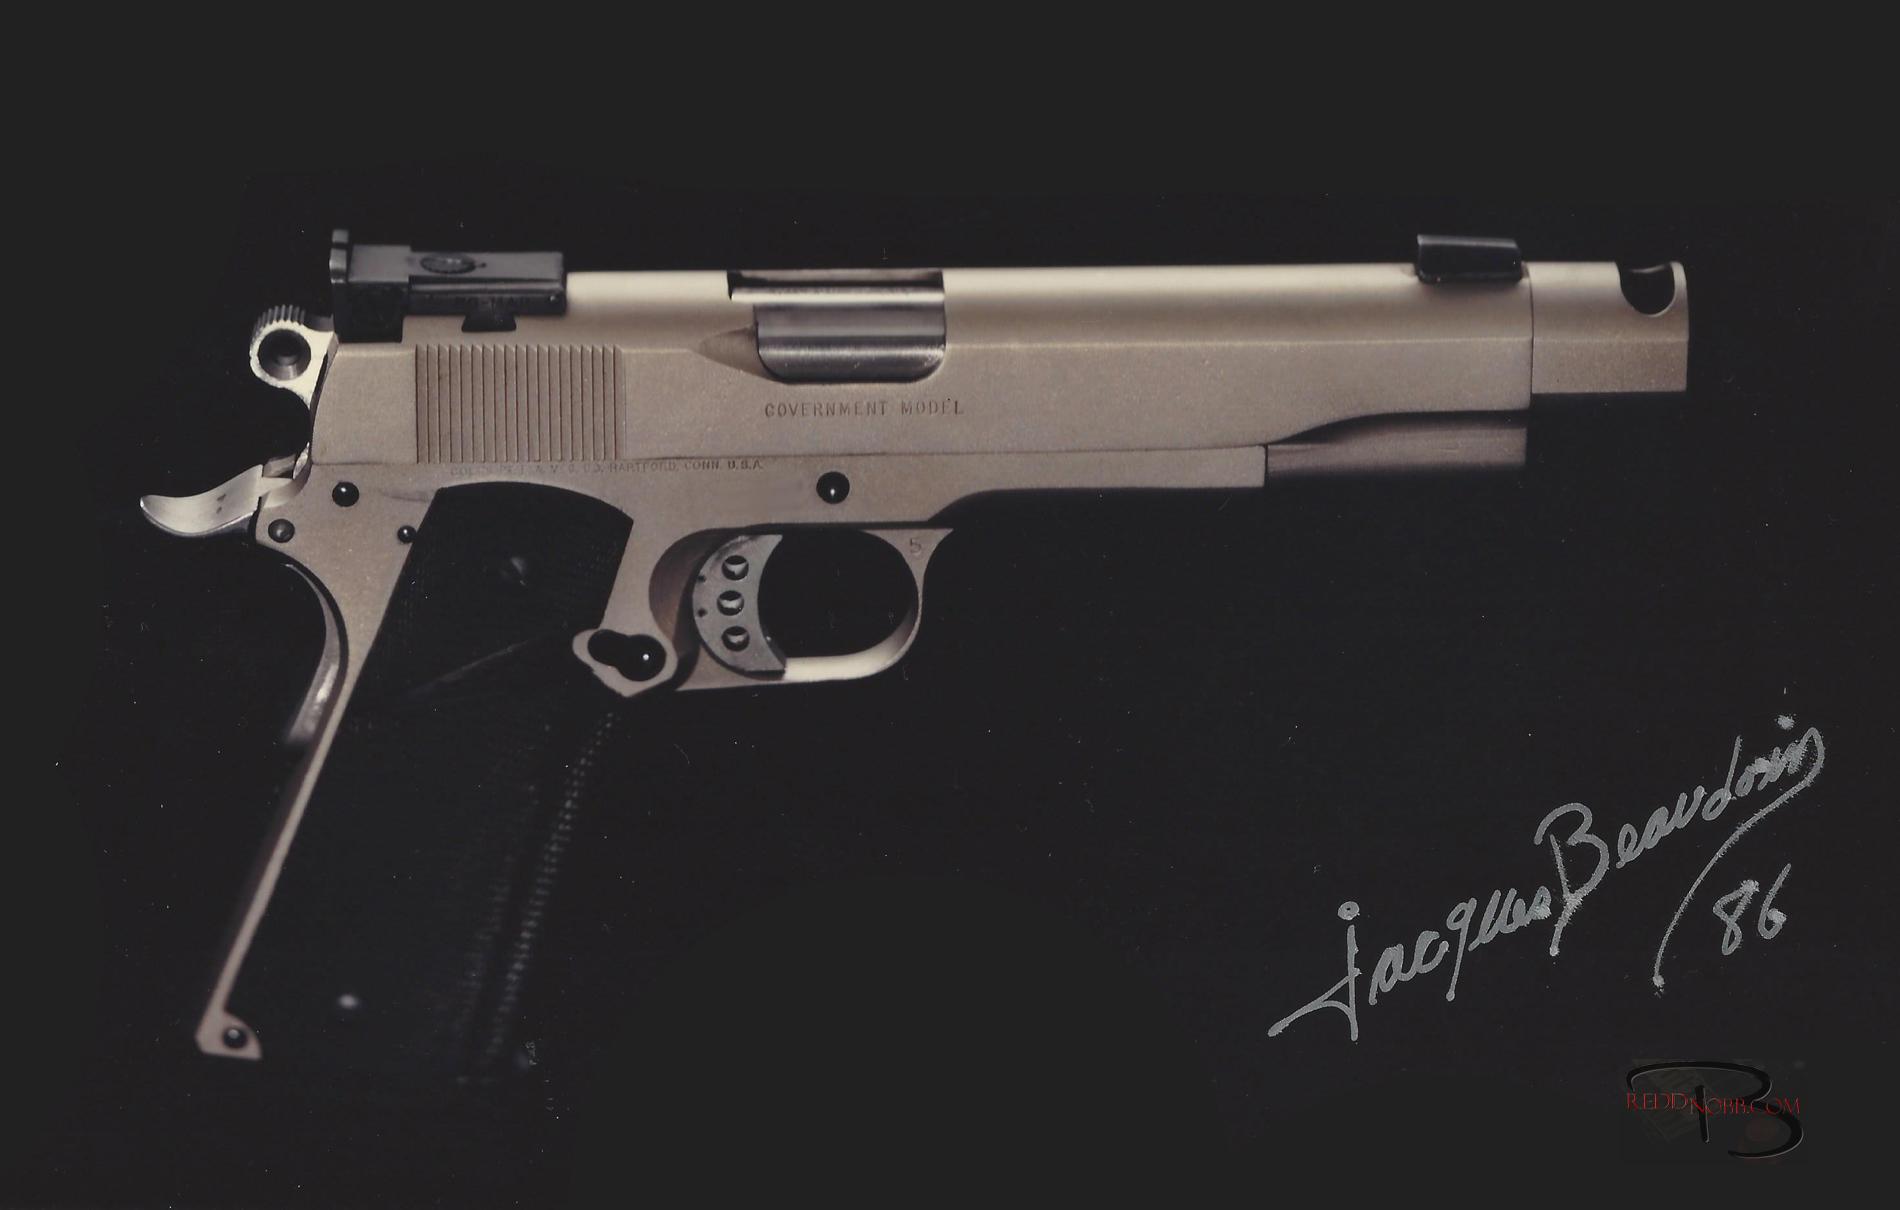 1986 custom colt 1911-a1 45 ACP